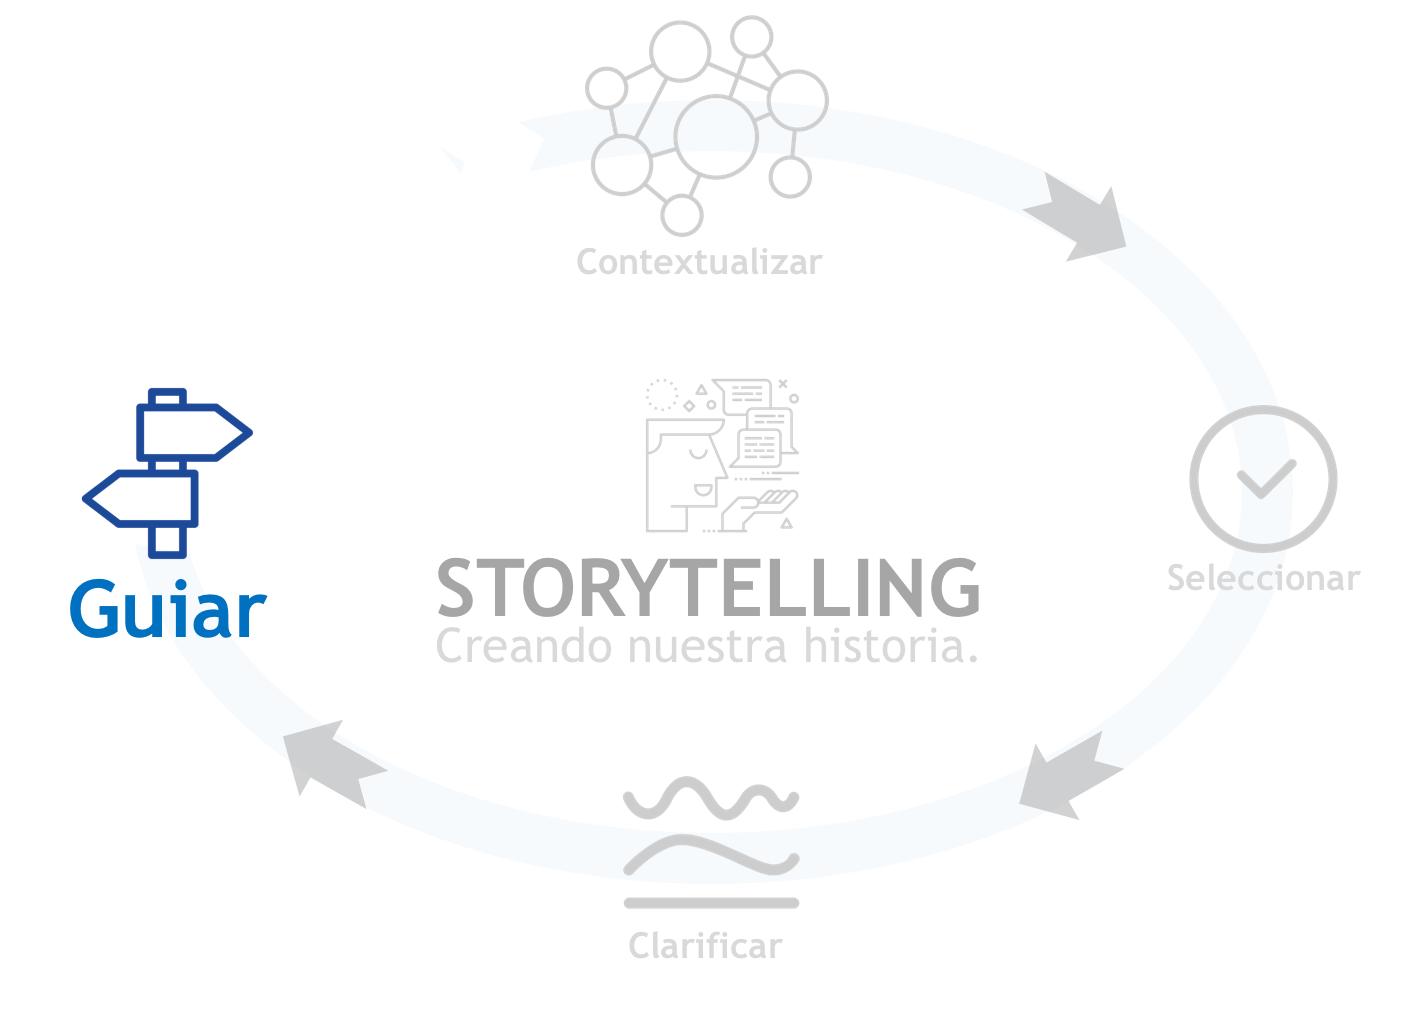 Guiar: Cuarta fase del ciclo del StoryTelling